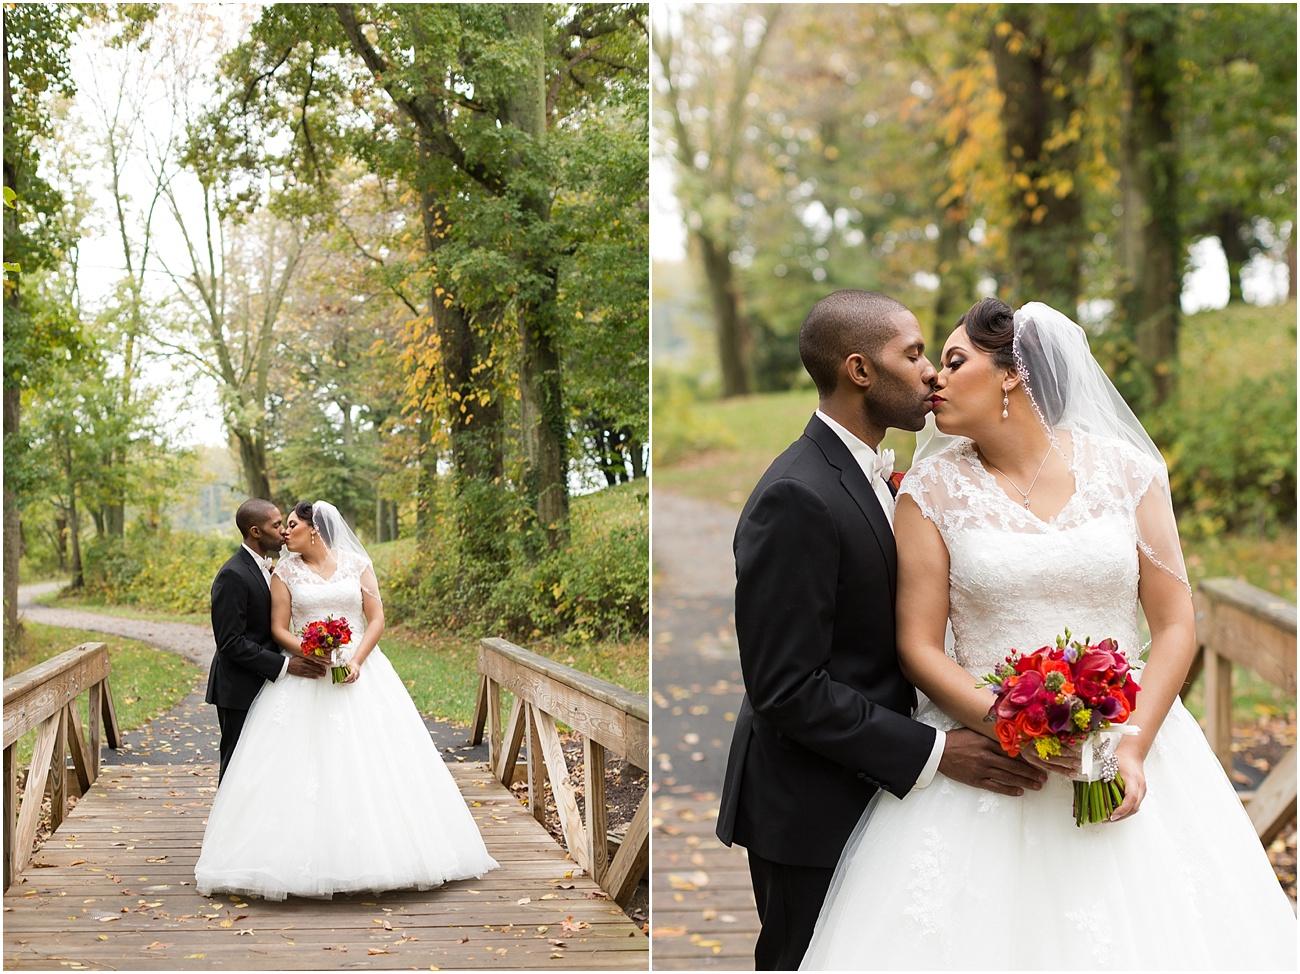 Tara+Charles_Columbia_Maryland_wedding_photographer_0002